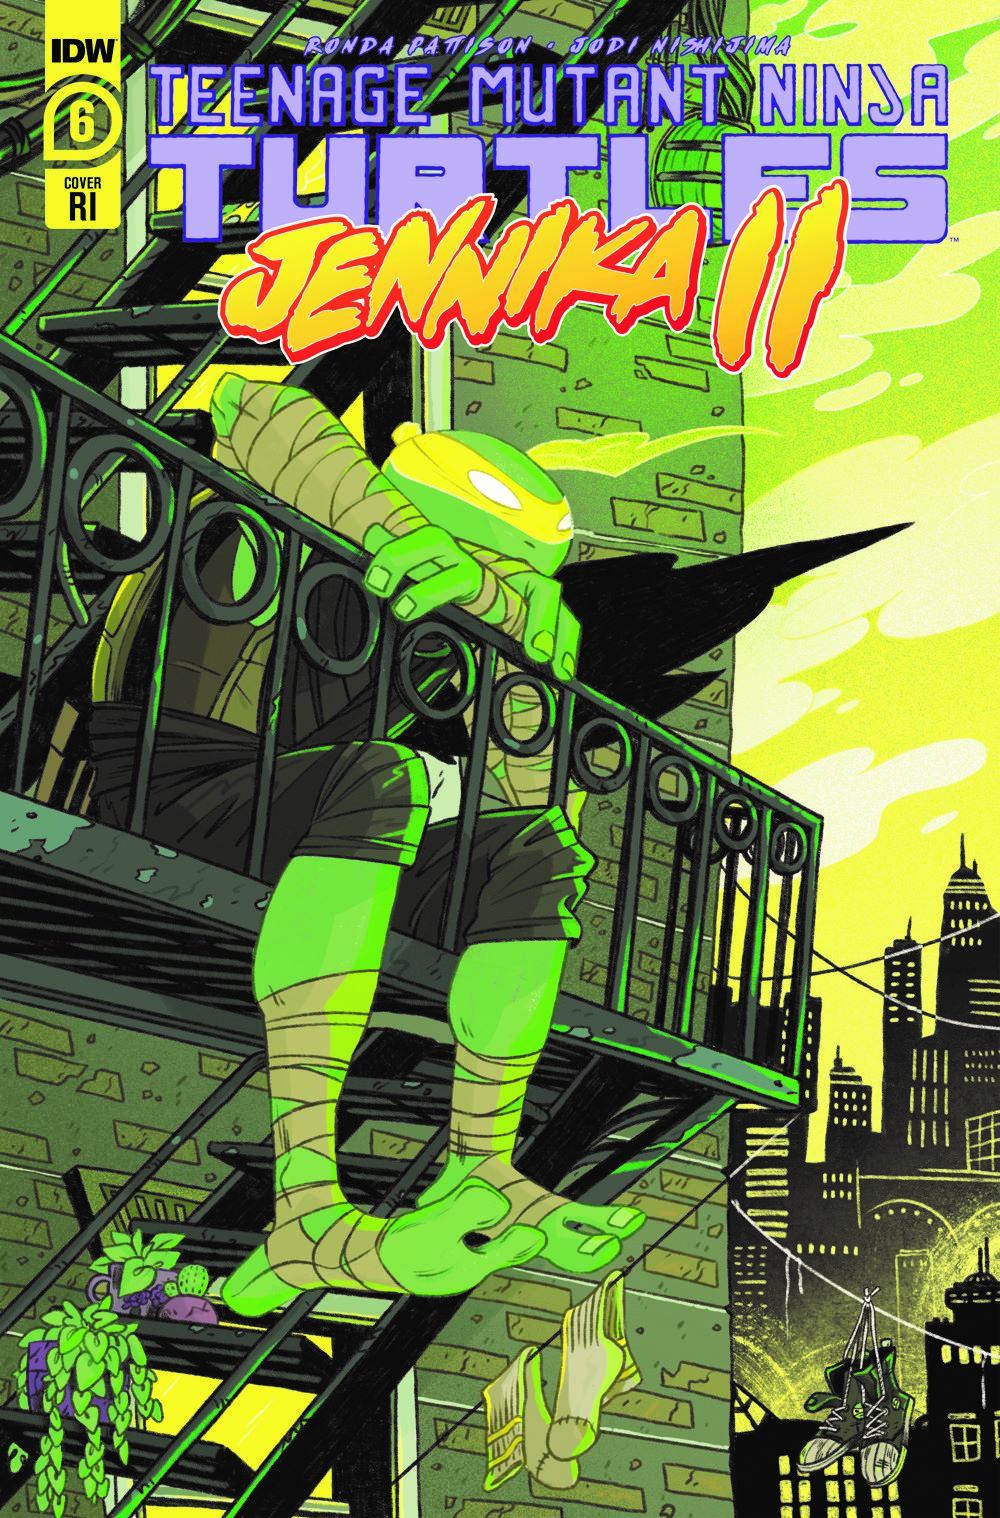 TMNT-Jennik-2 ComicList: IDW Publishing New Releases for 04/14/2021